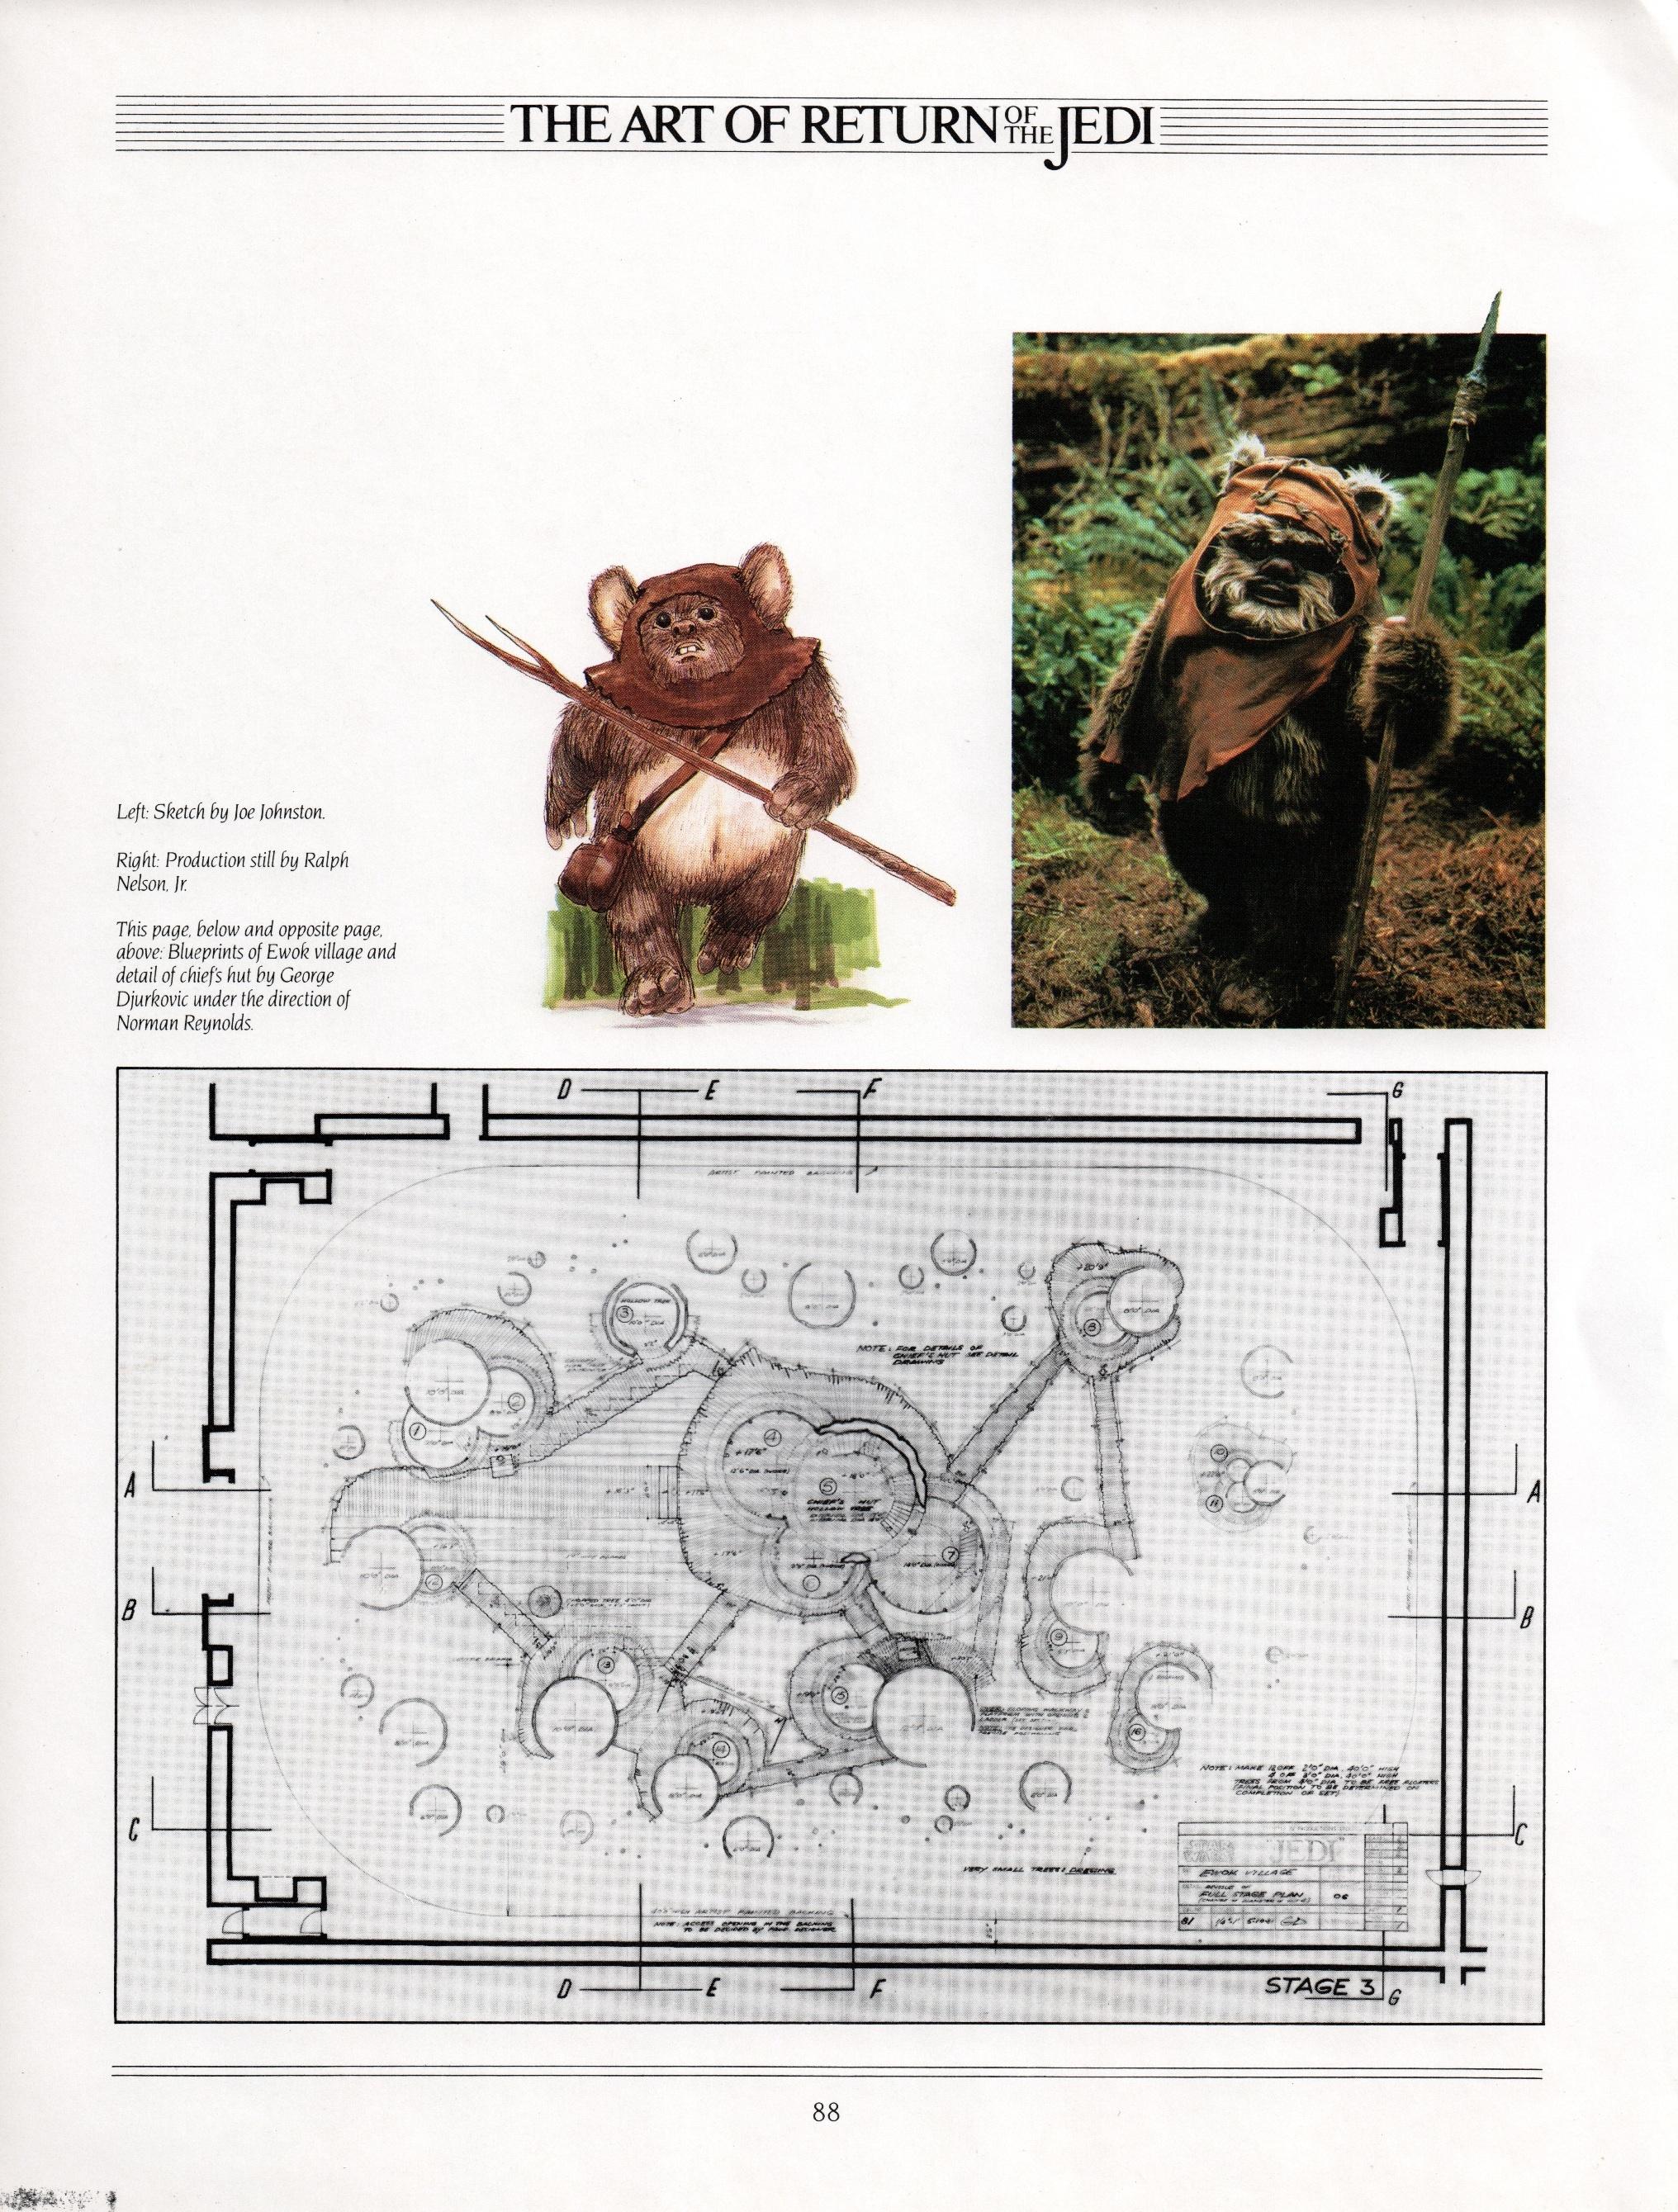 Art of Return of the Jedi (b0bafett_Empire)-p088